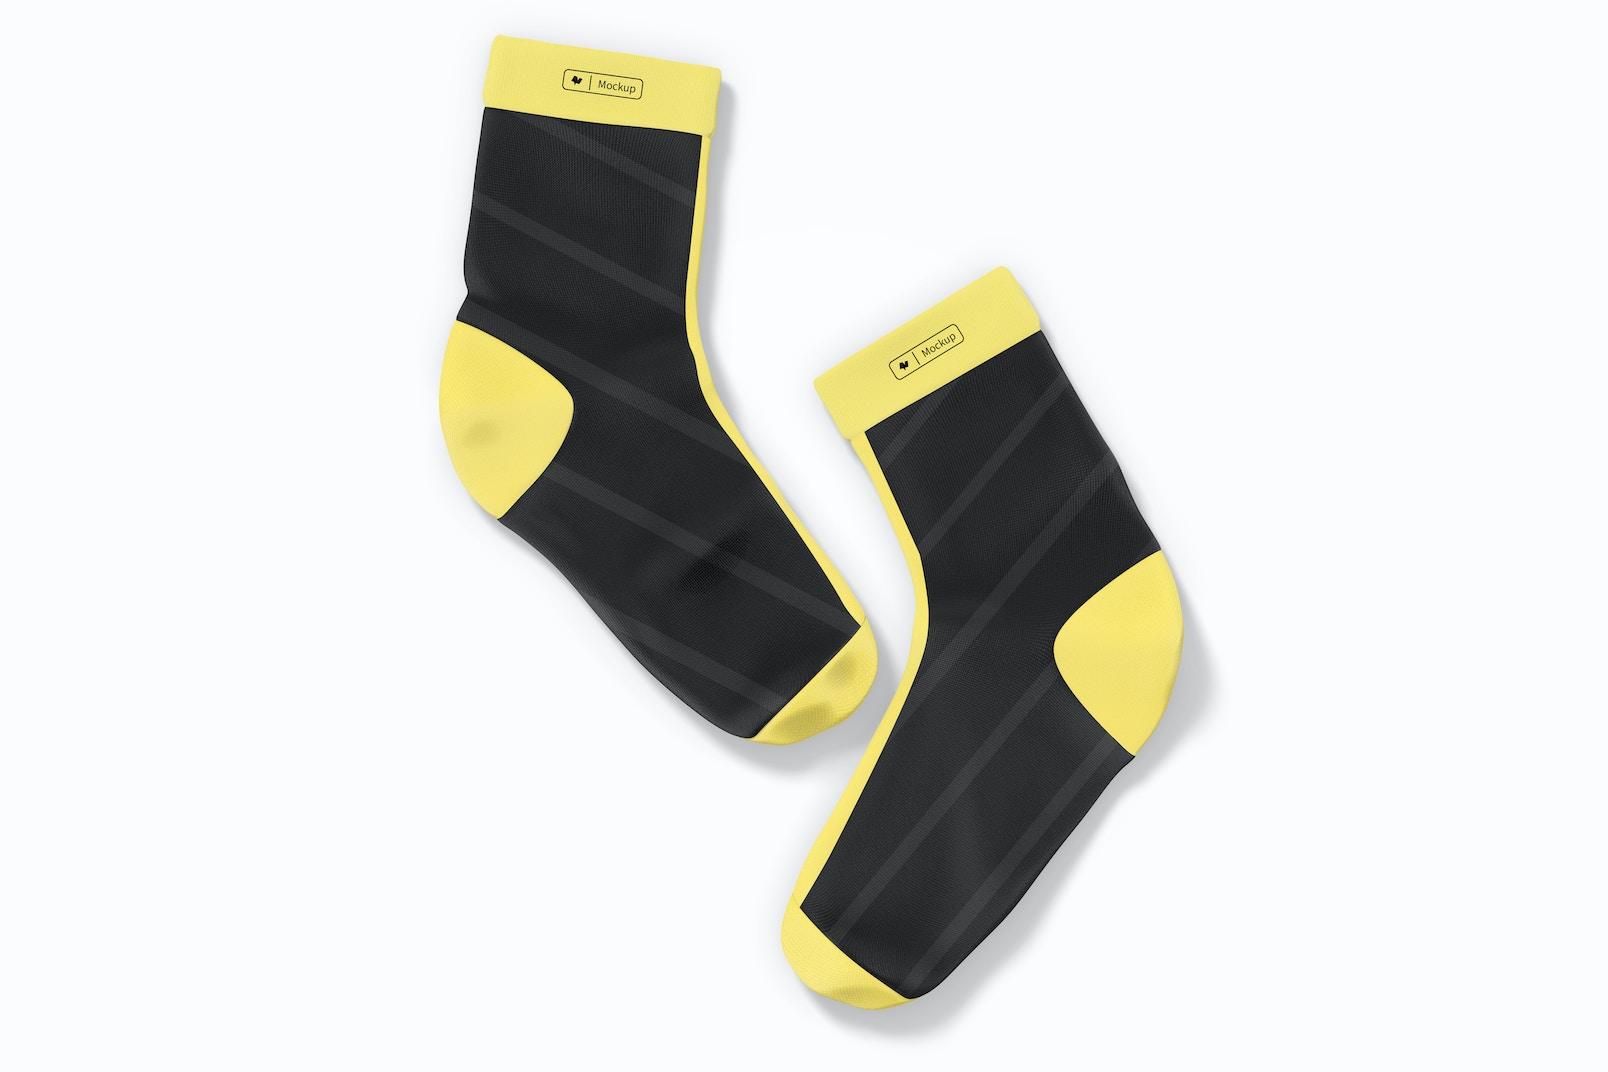 Sports Cycling Socks Mockup, Top View